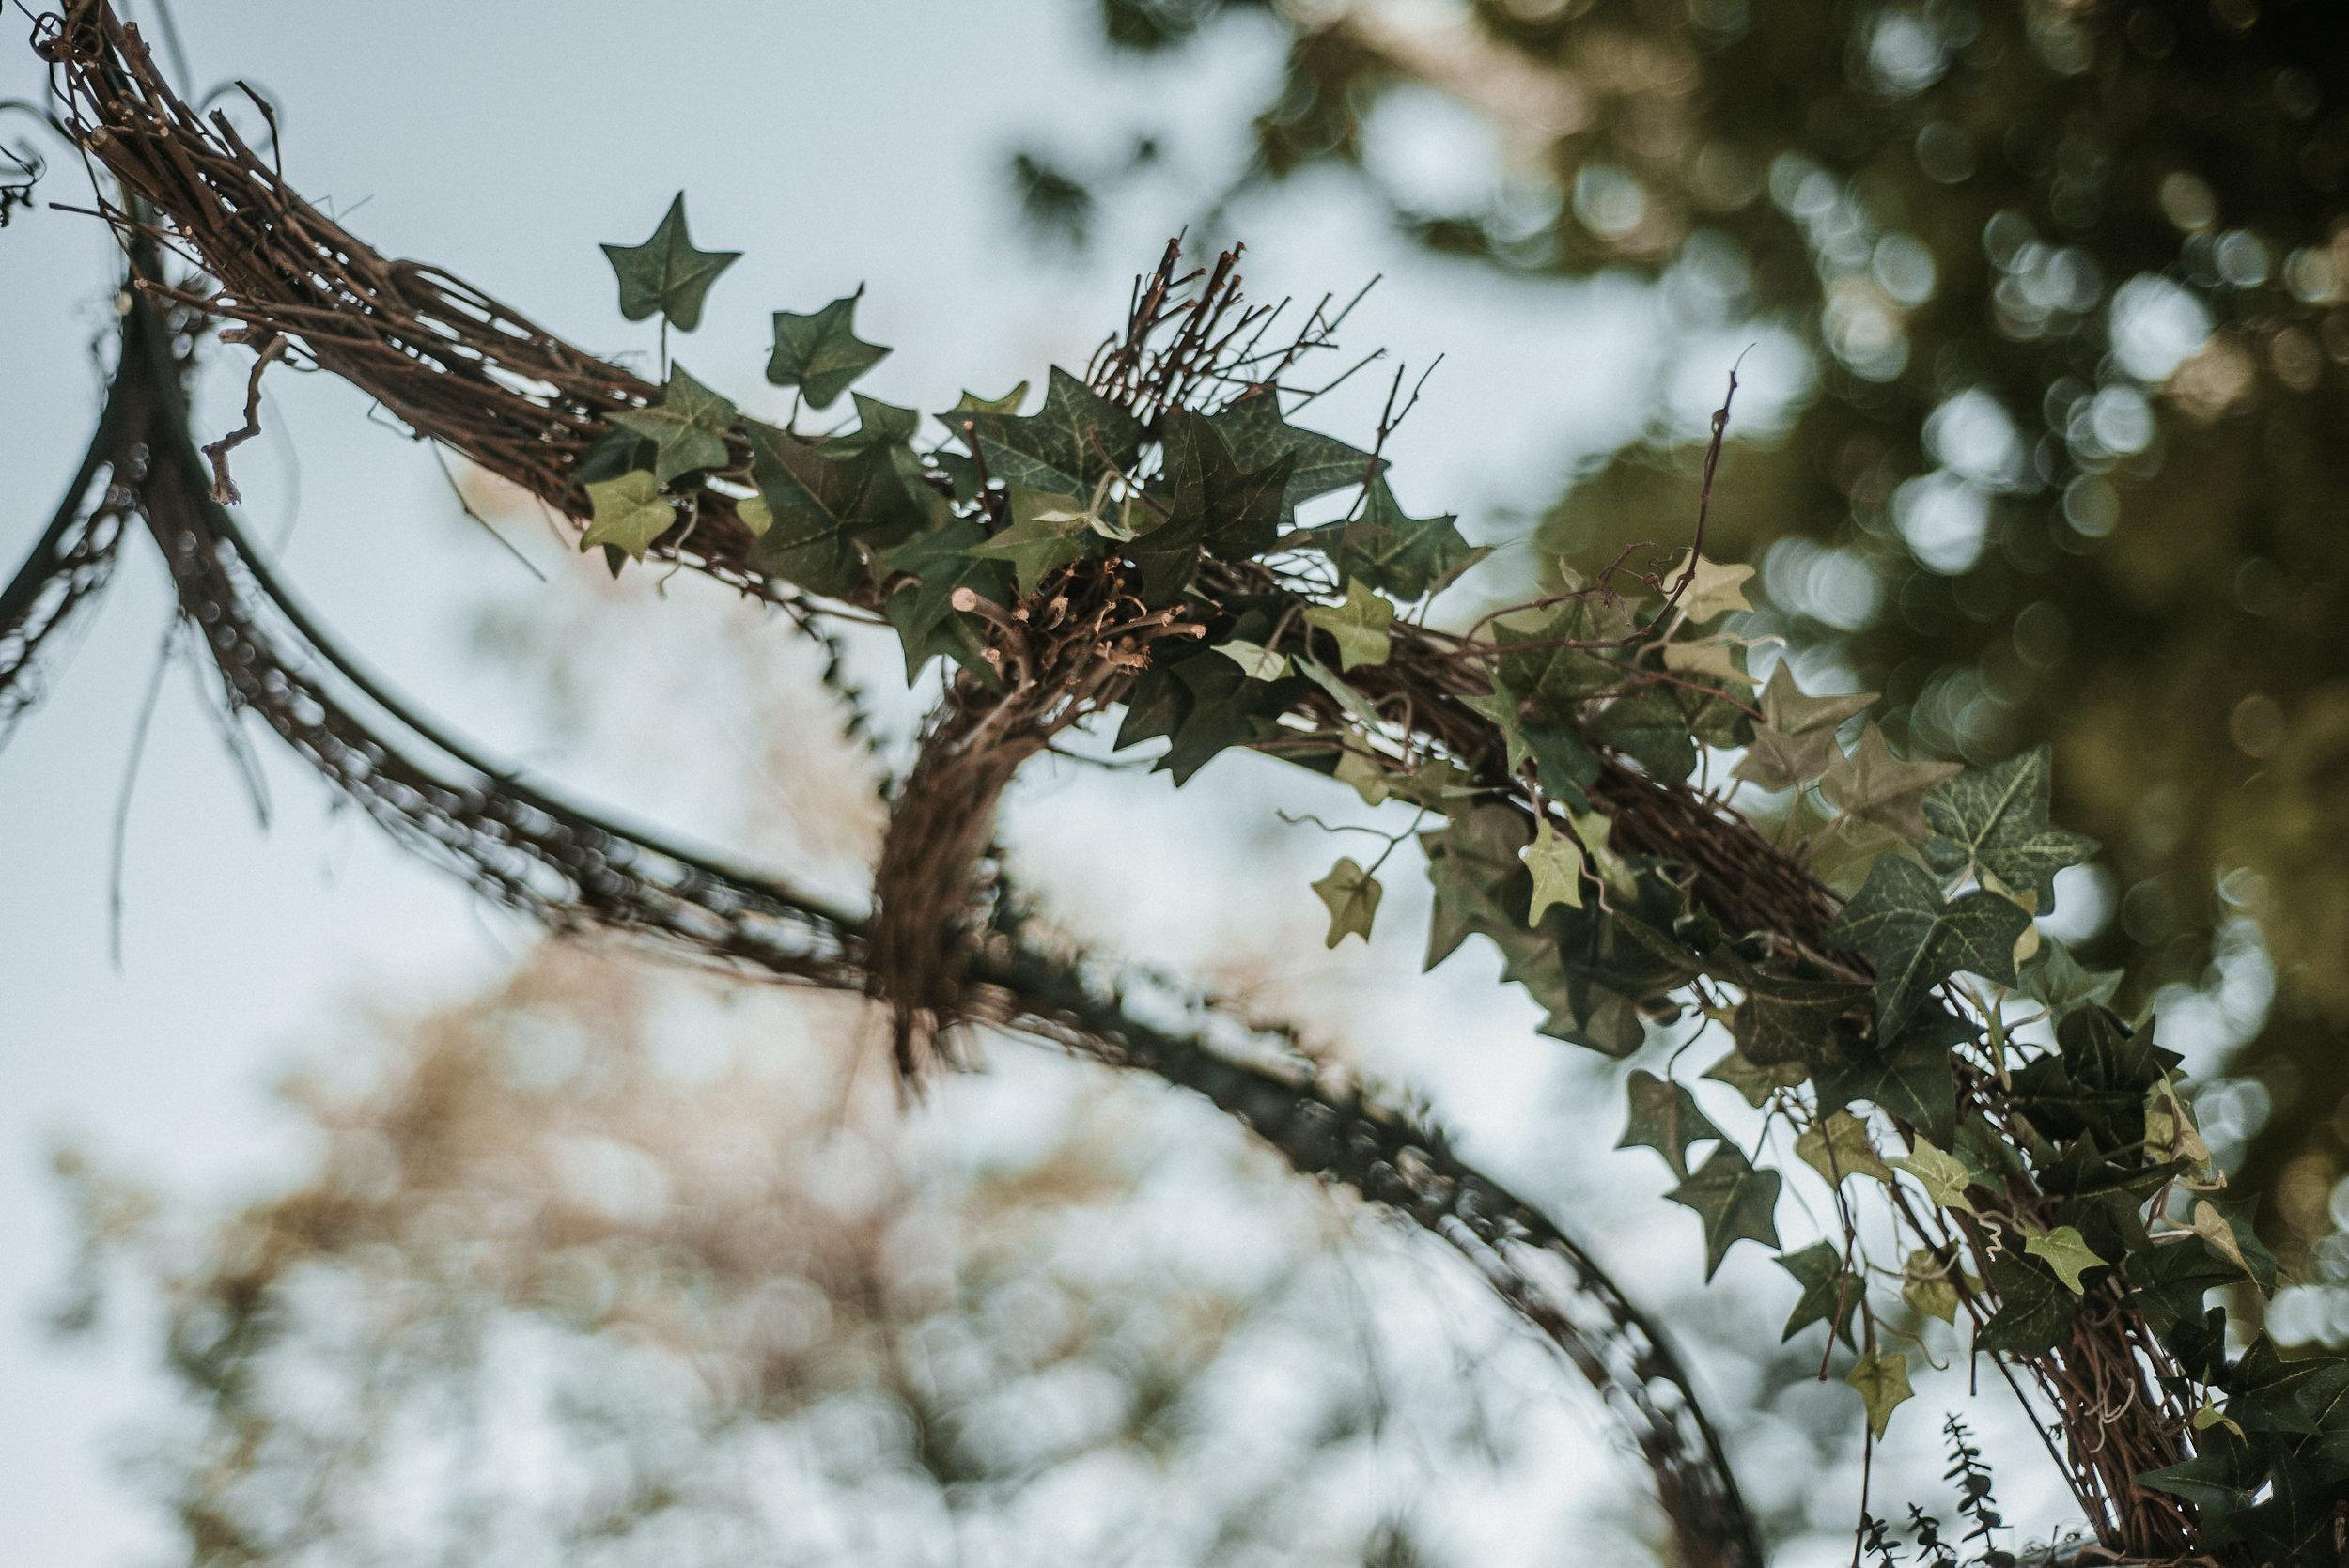 Ivy vines at wedding ceremony